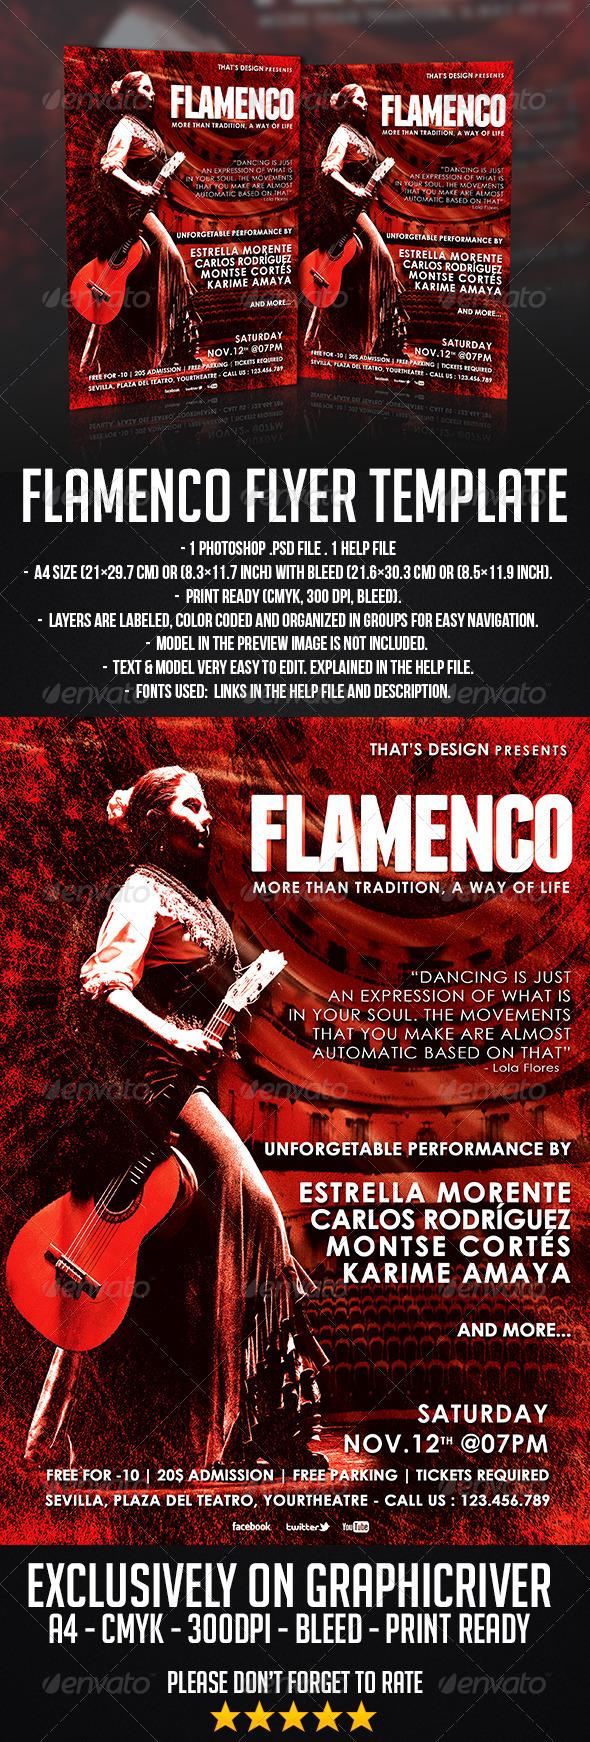 GraphicRiver Flamenco Flyer Template 6951357